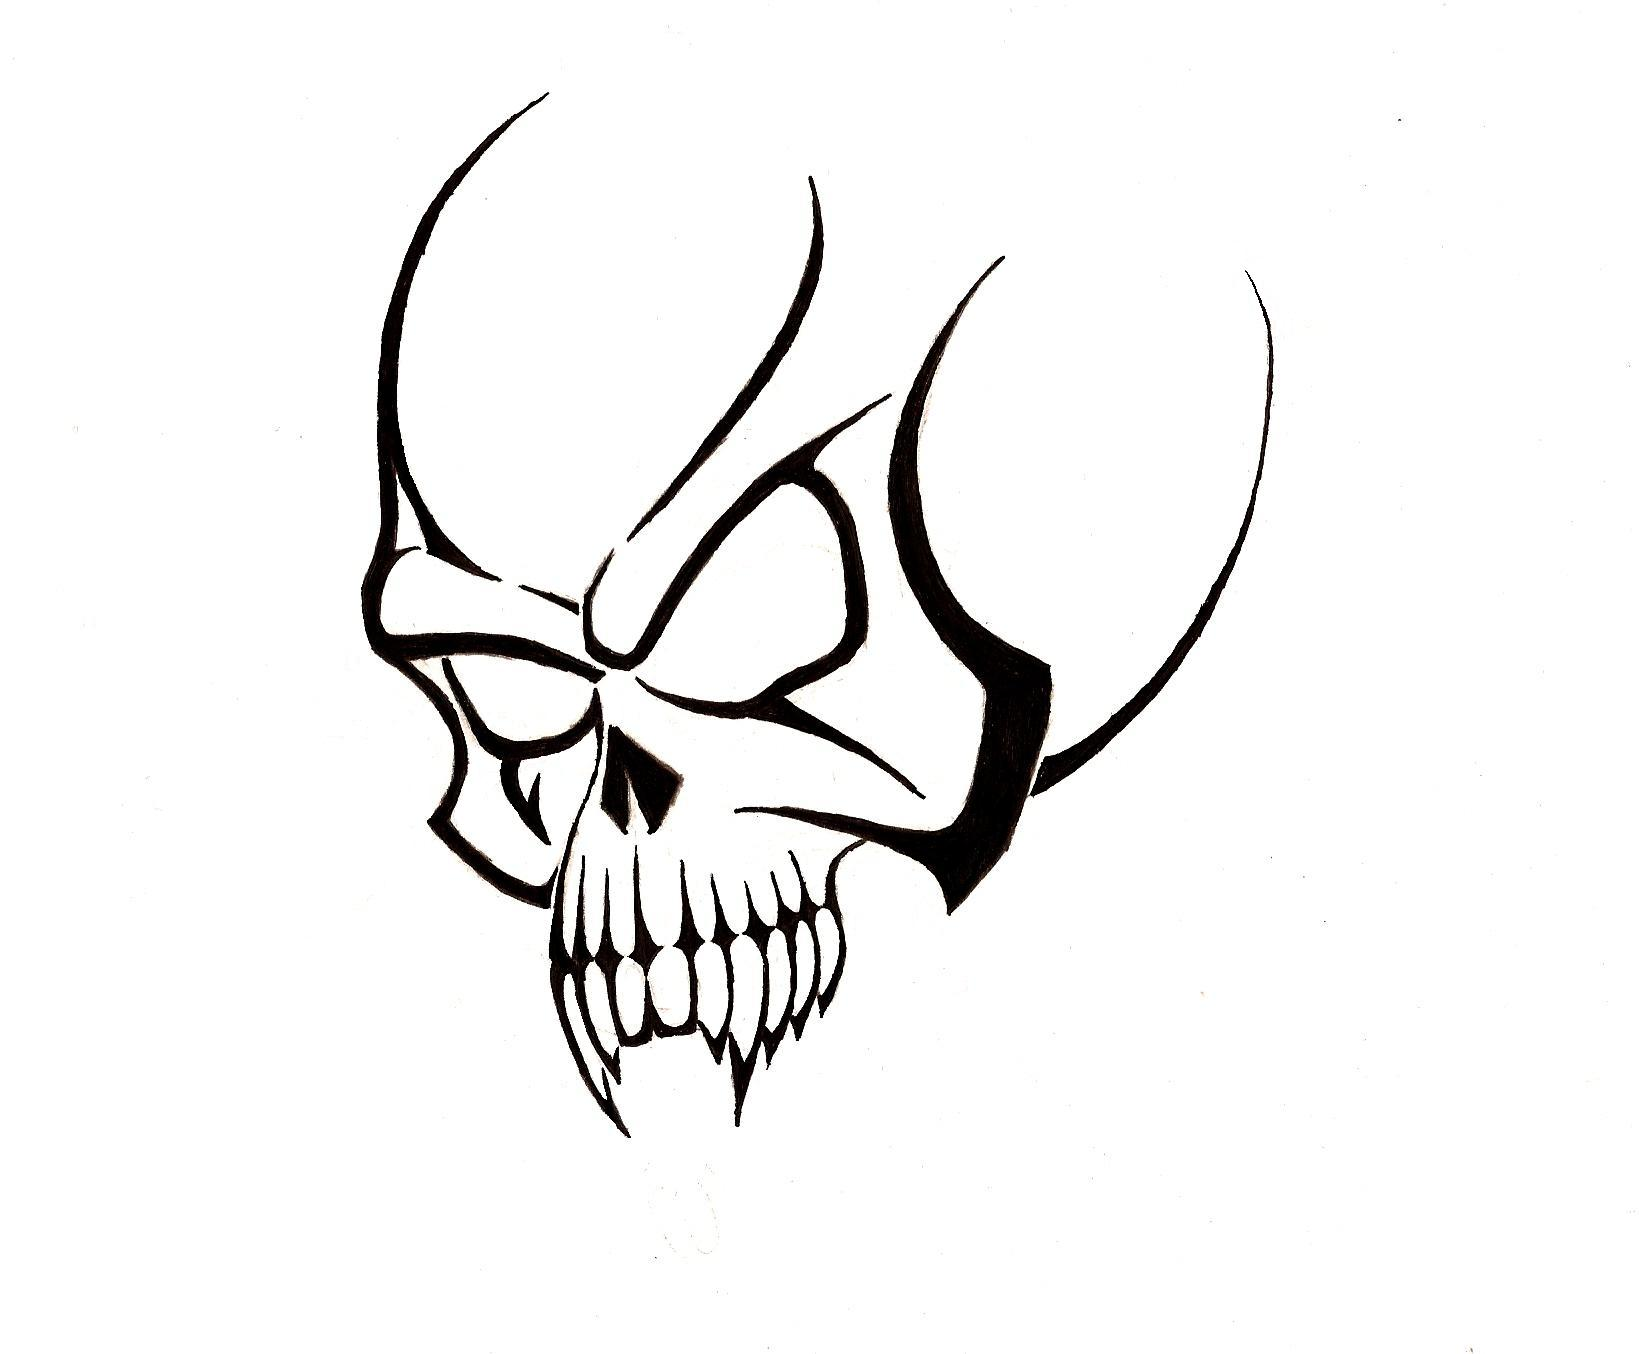 1639x1354 Skull Tattoo Meaning